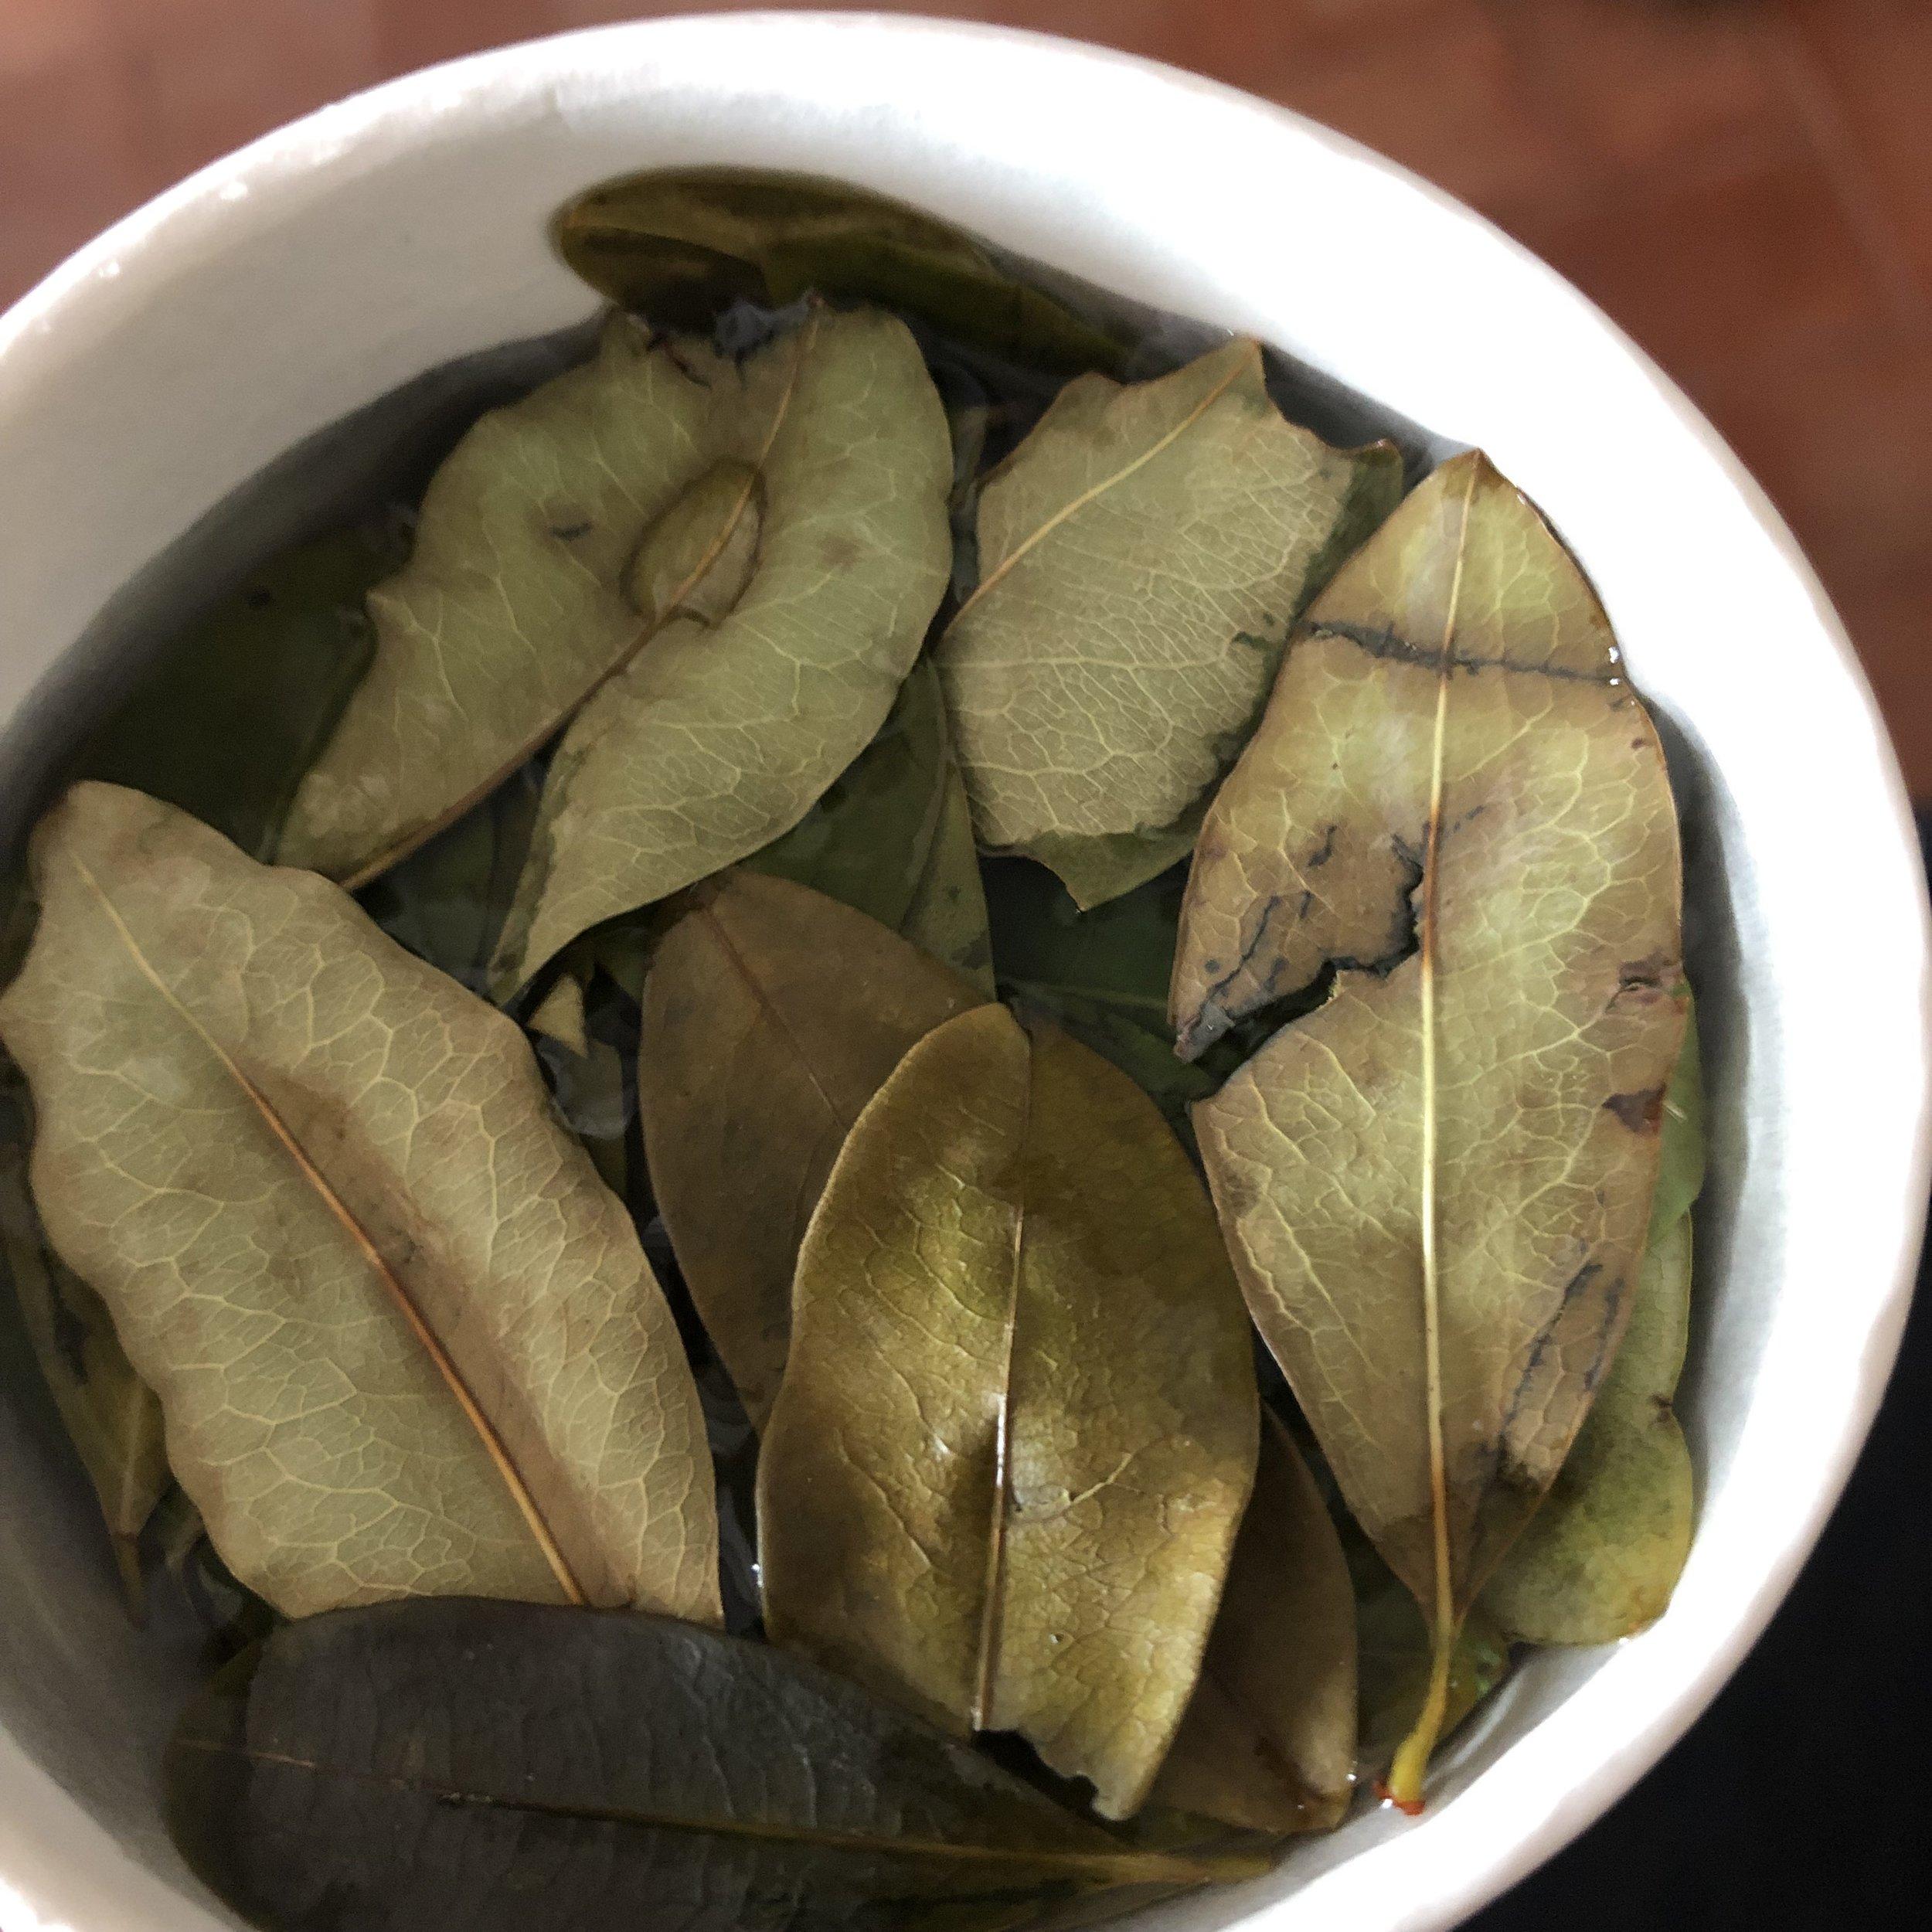 Coca tea in Cusco. Didn't do much for me.